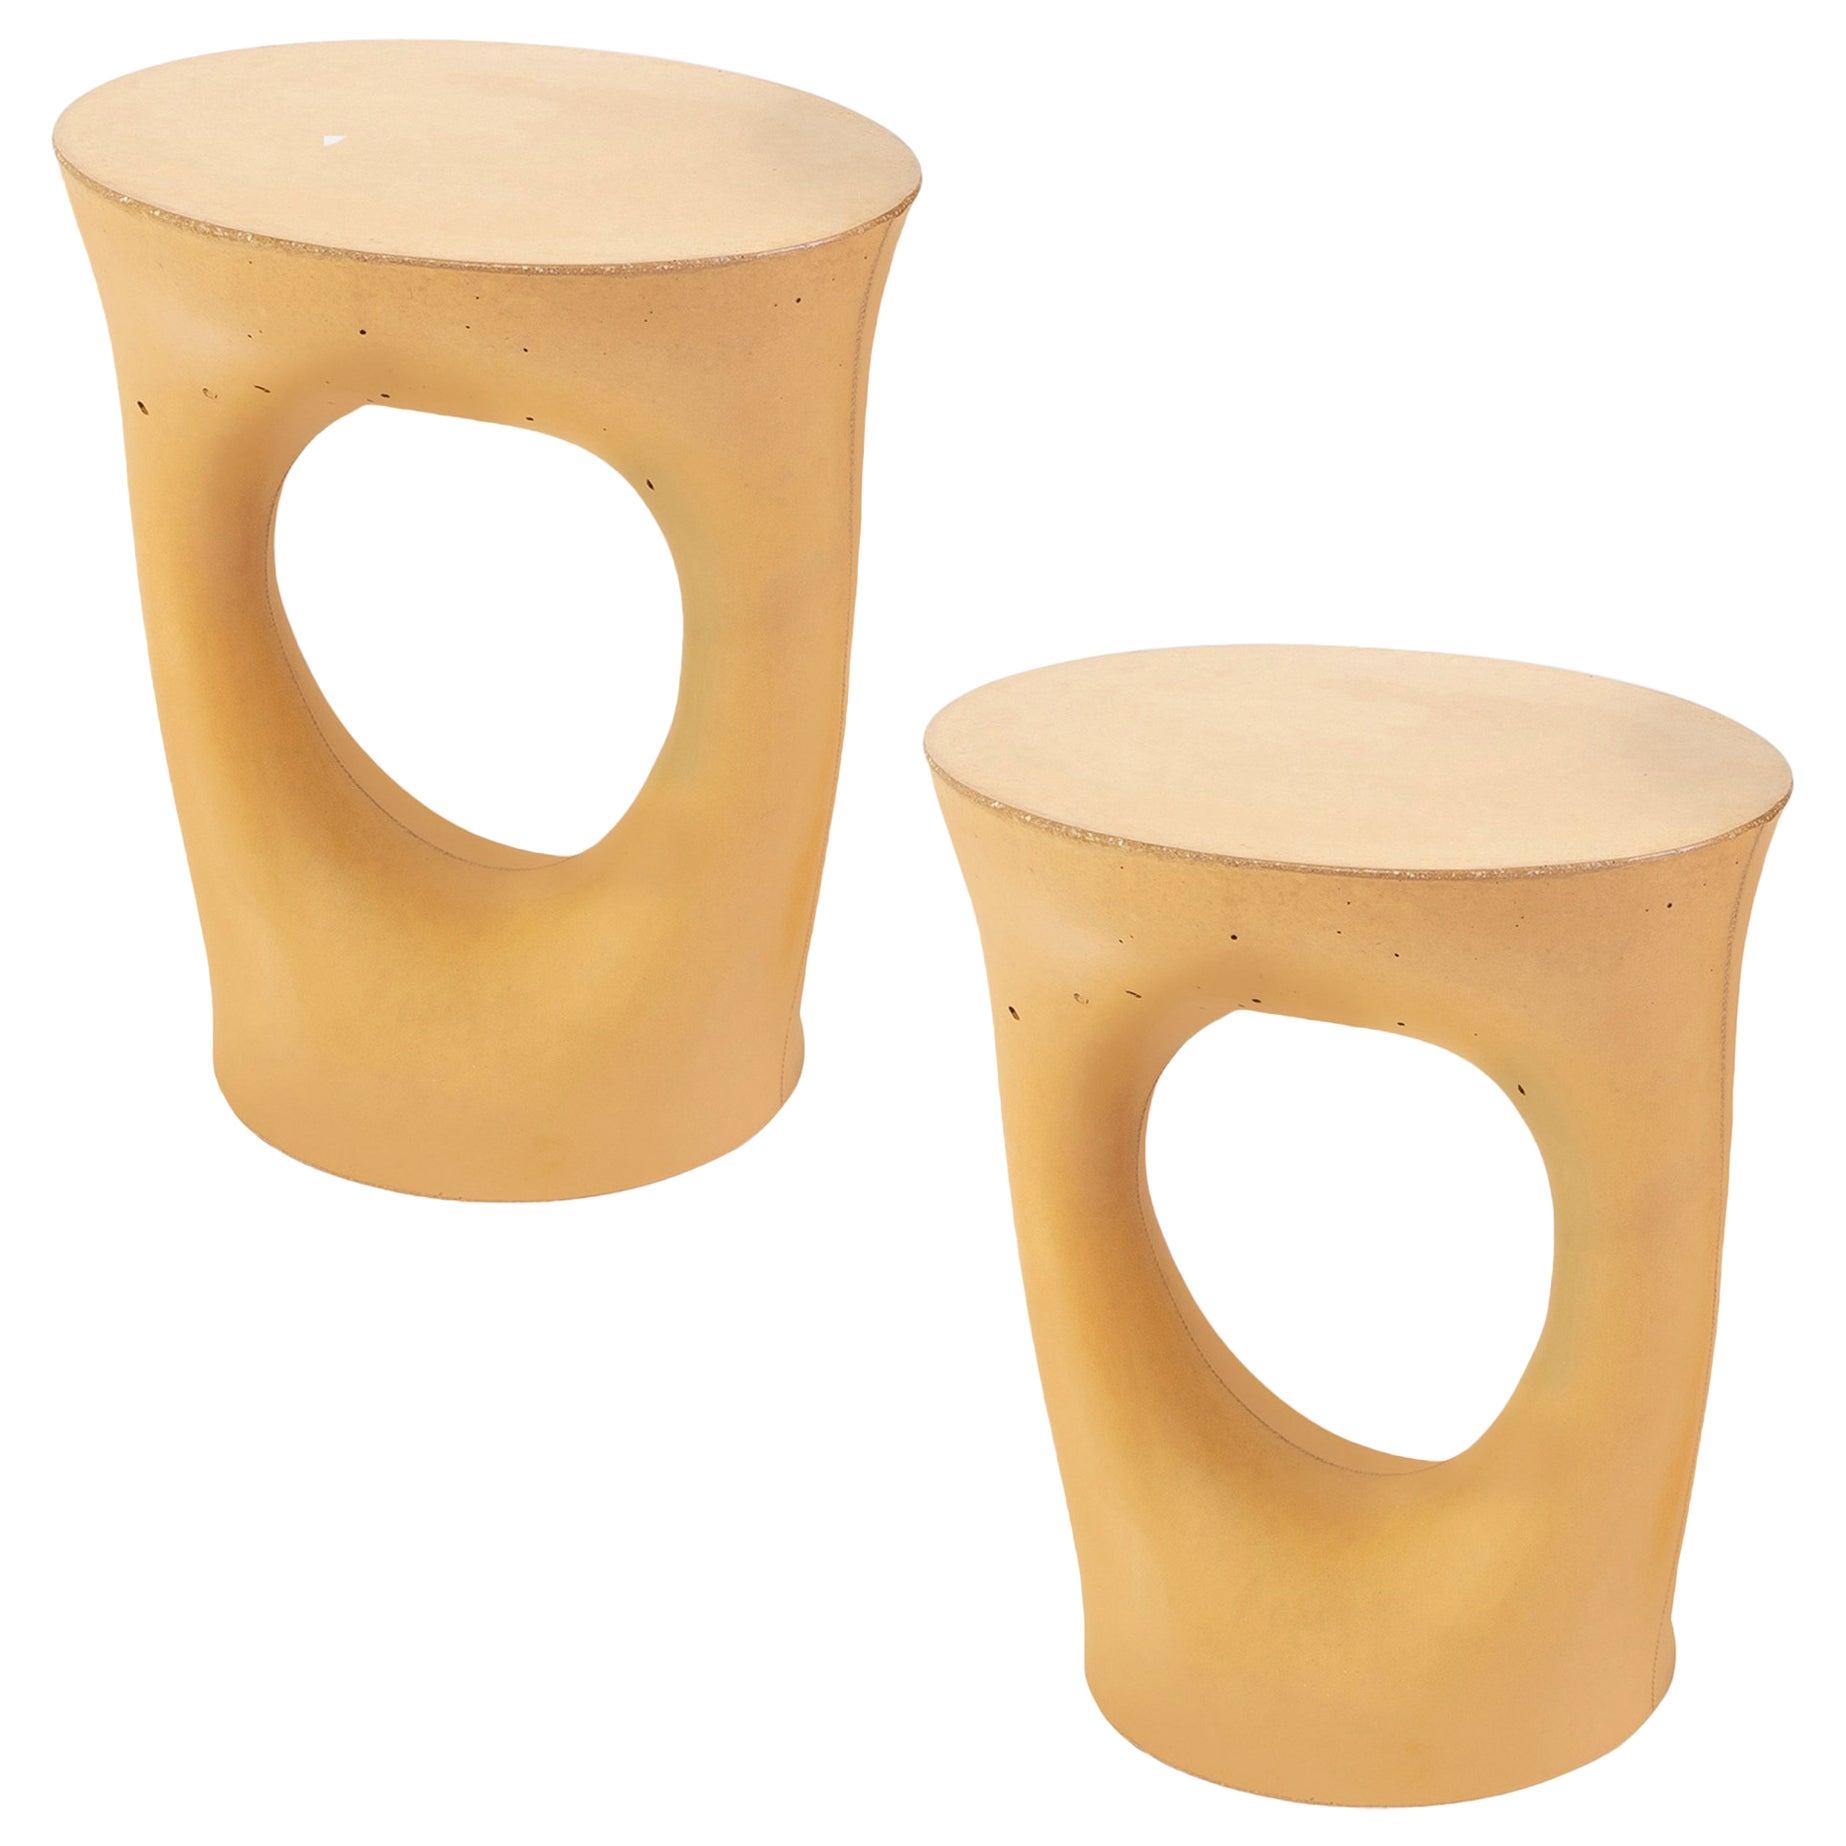 Pair of Short Mustard Kreten Side Tables from Souda, Made to Order